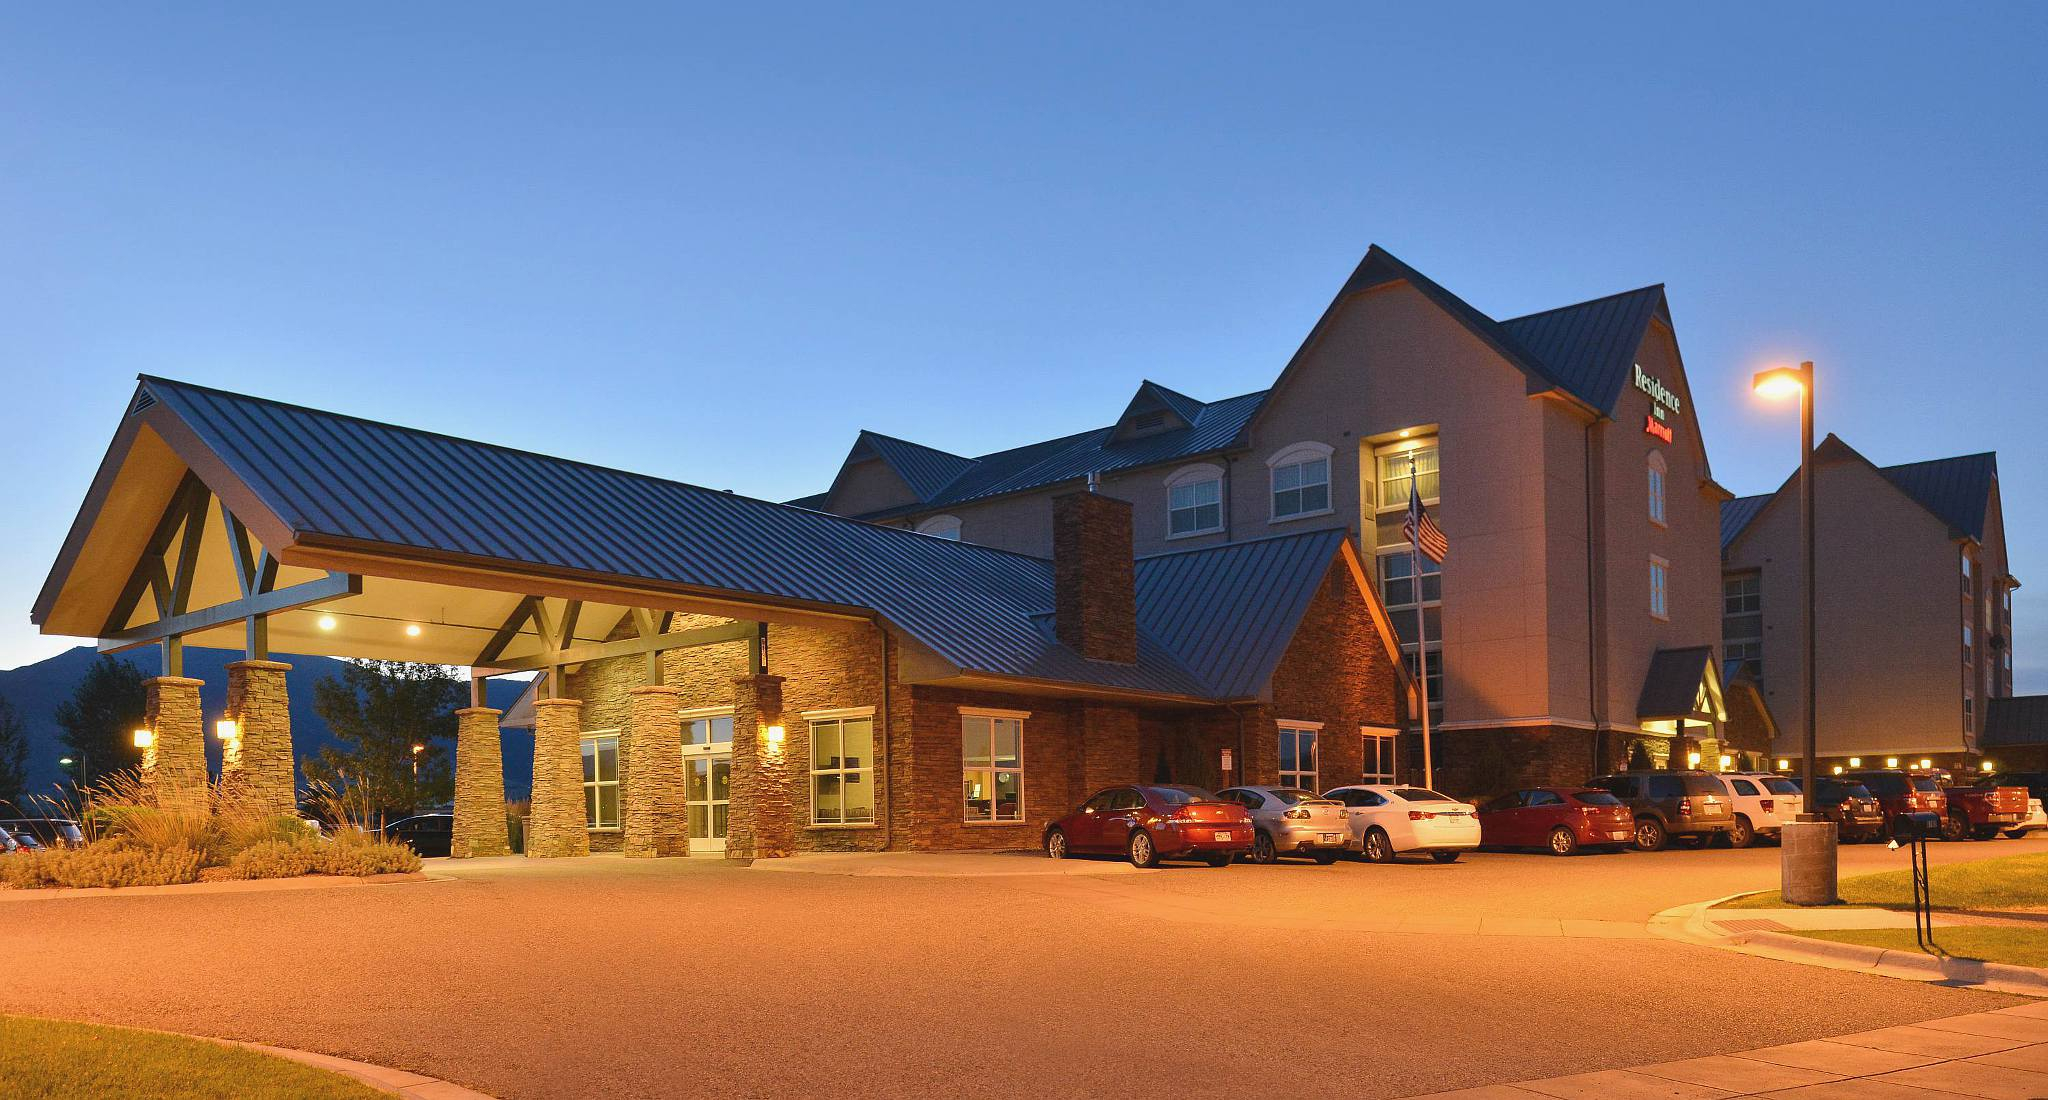 Bozeman Hotels Like Residence Inn by Marriott